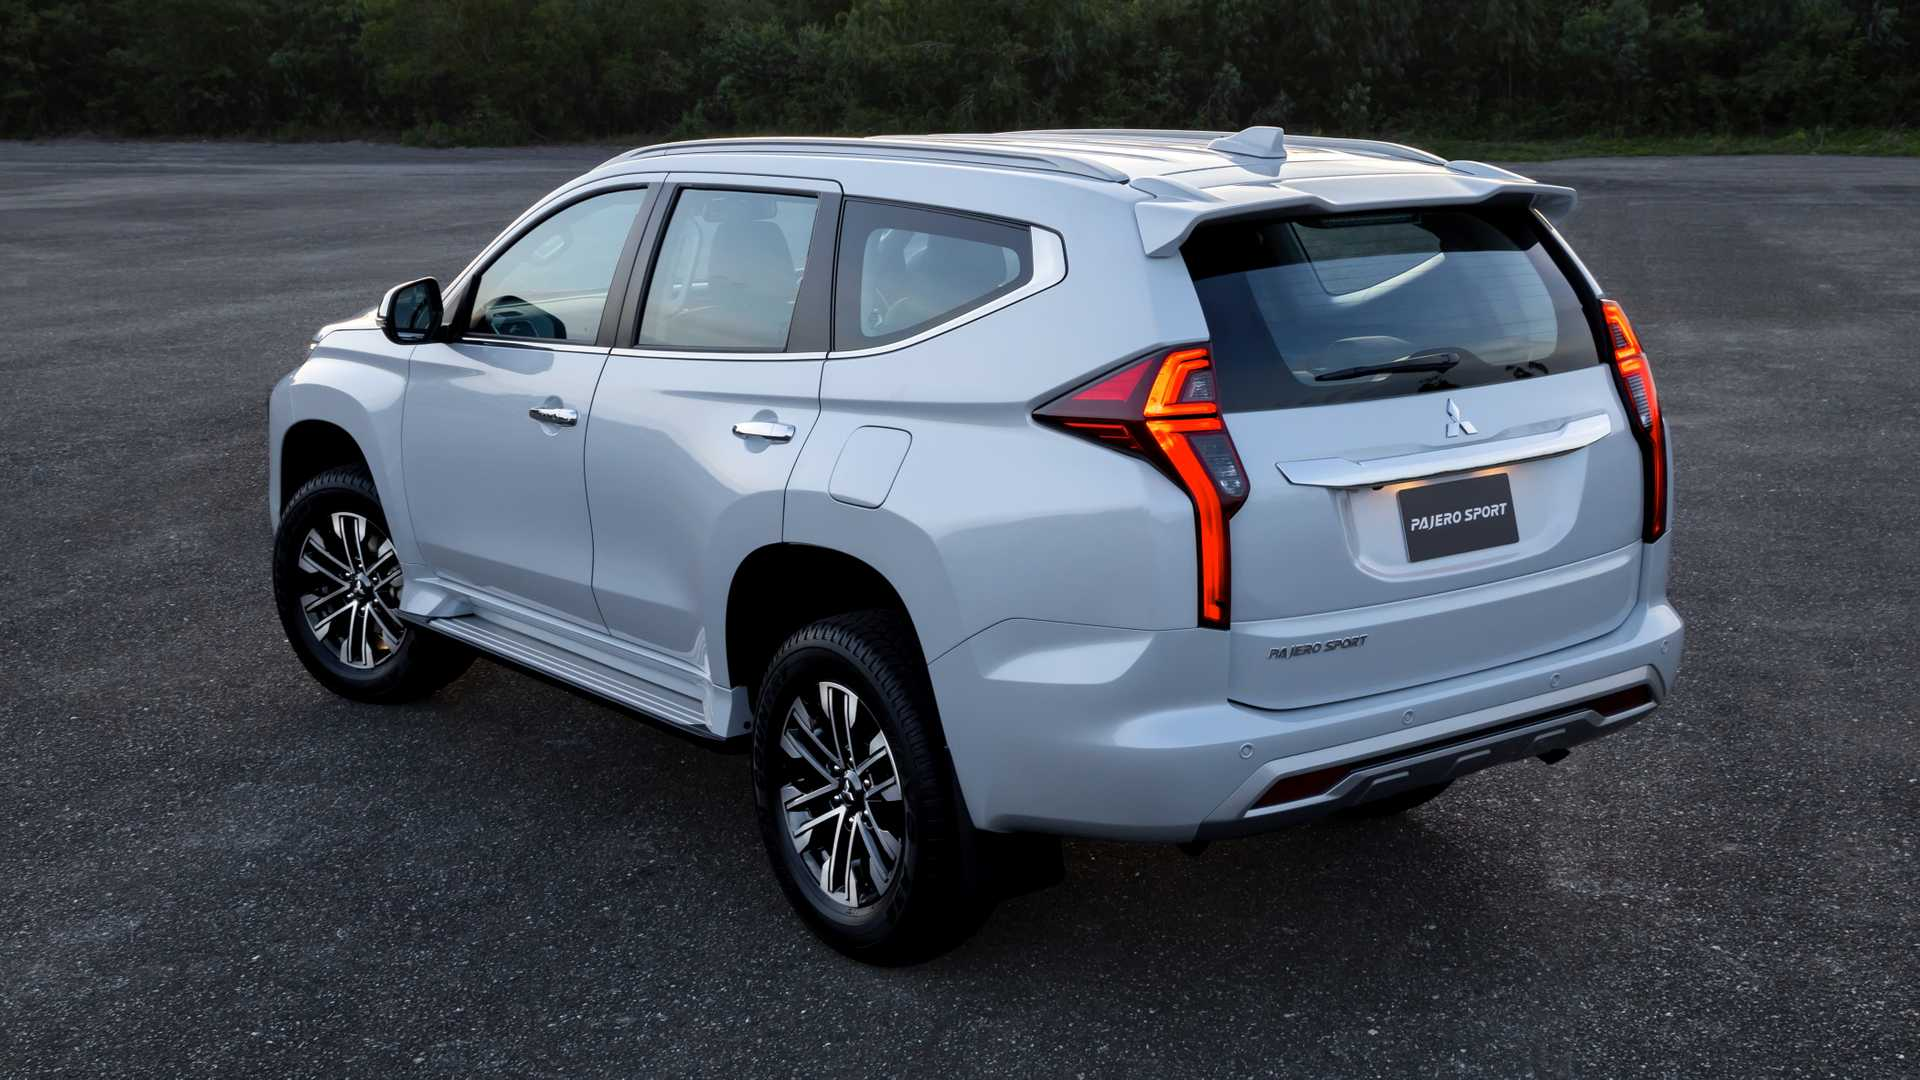 2020_Mitsubishi_Pajero_Sport_facelift_0014